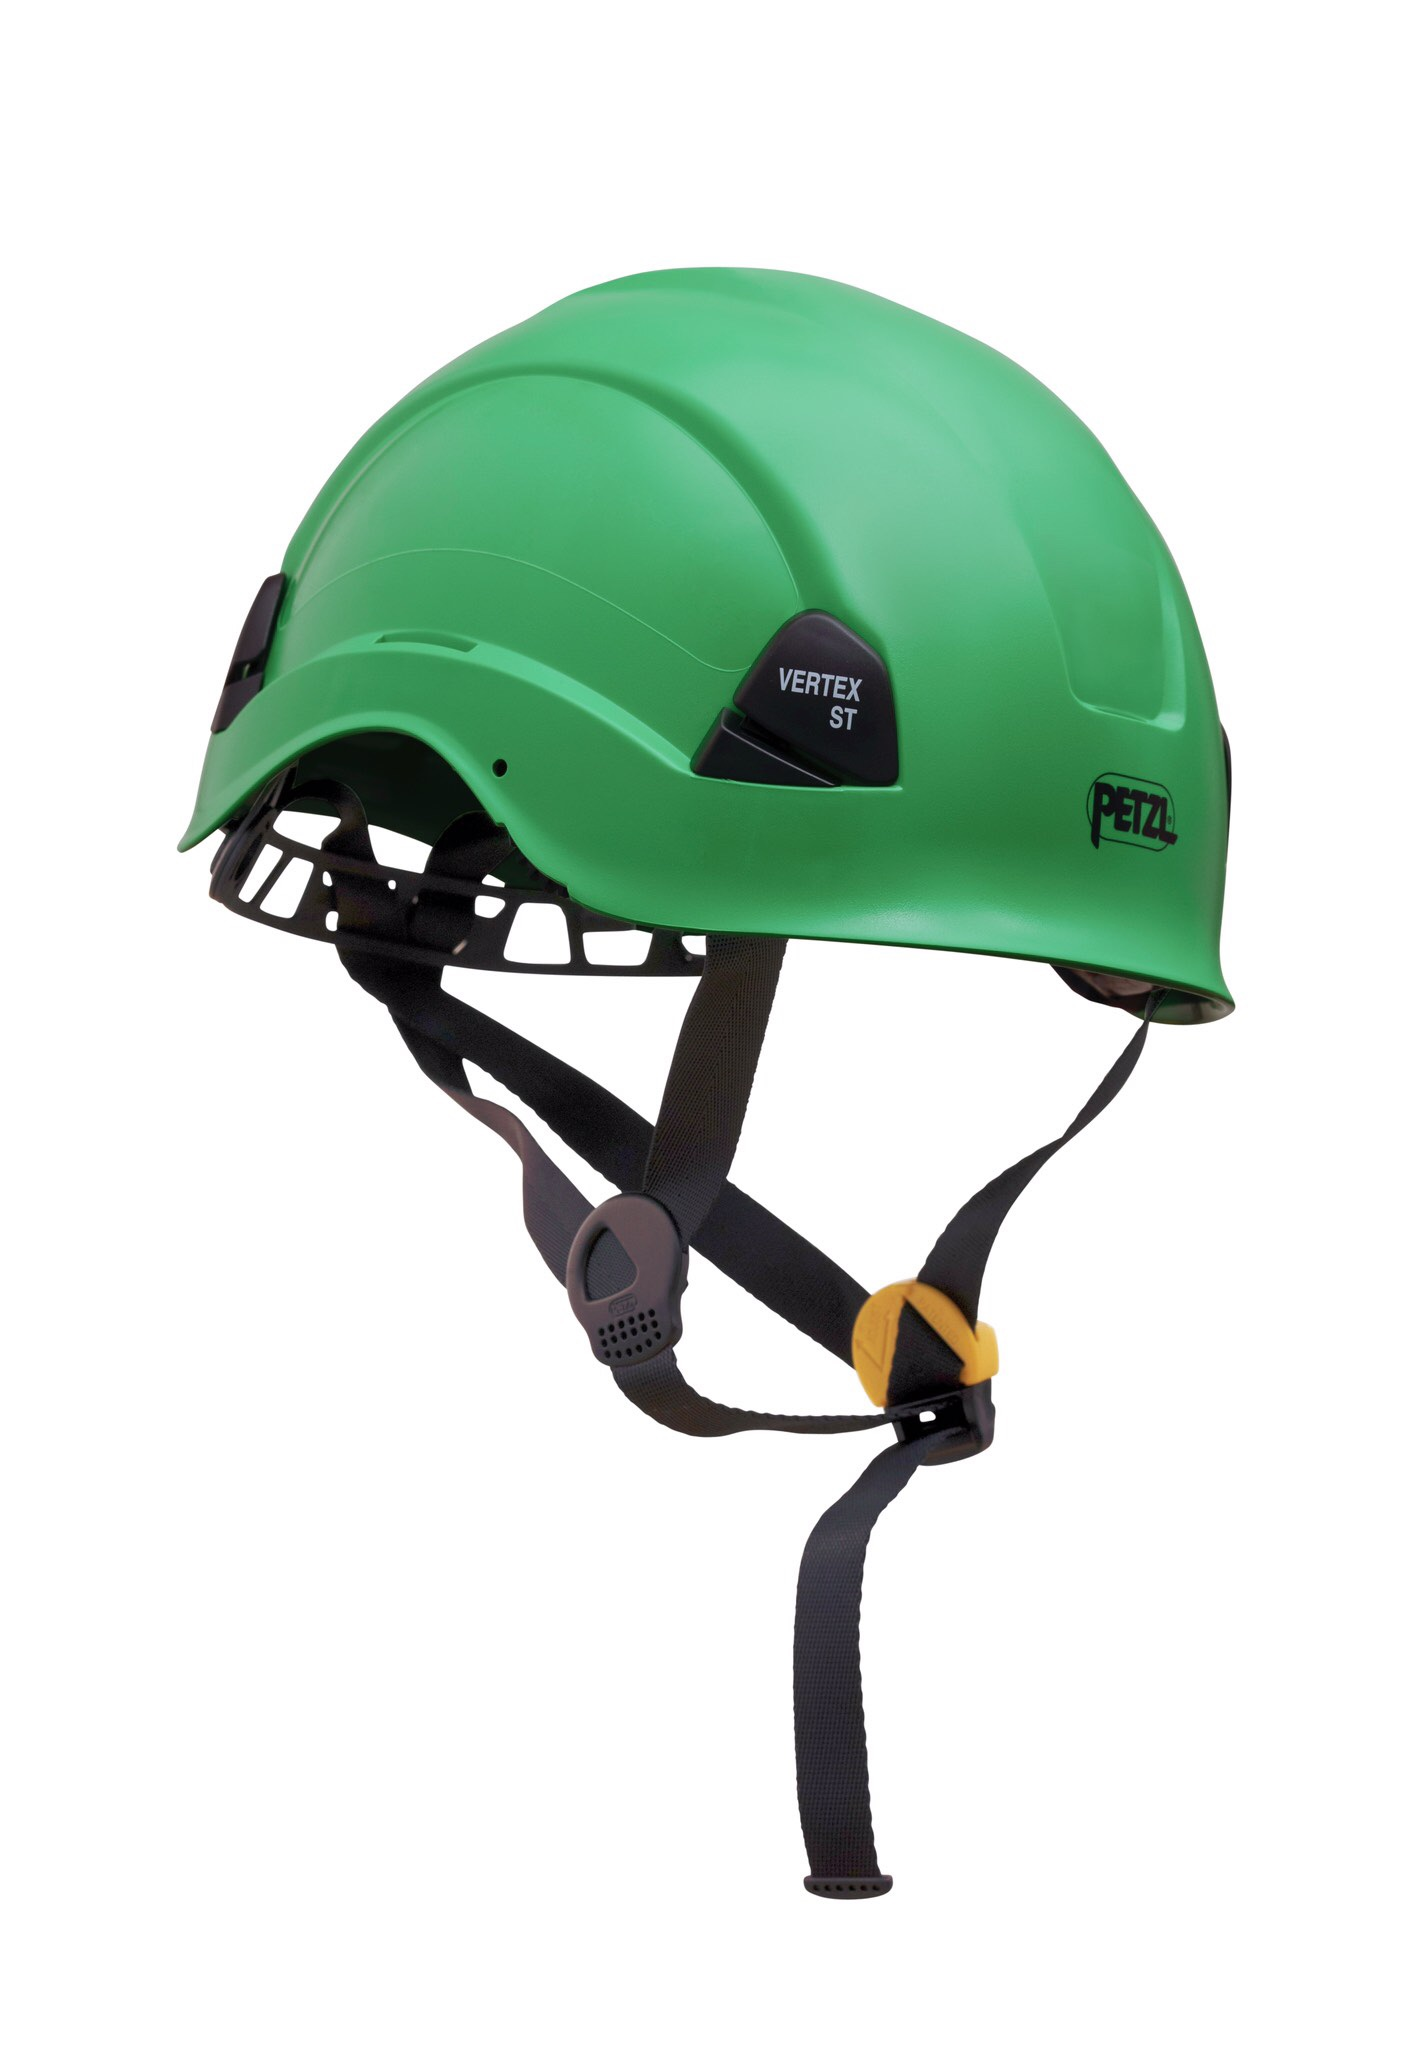 C2 Vertical Safety